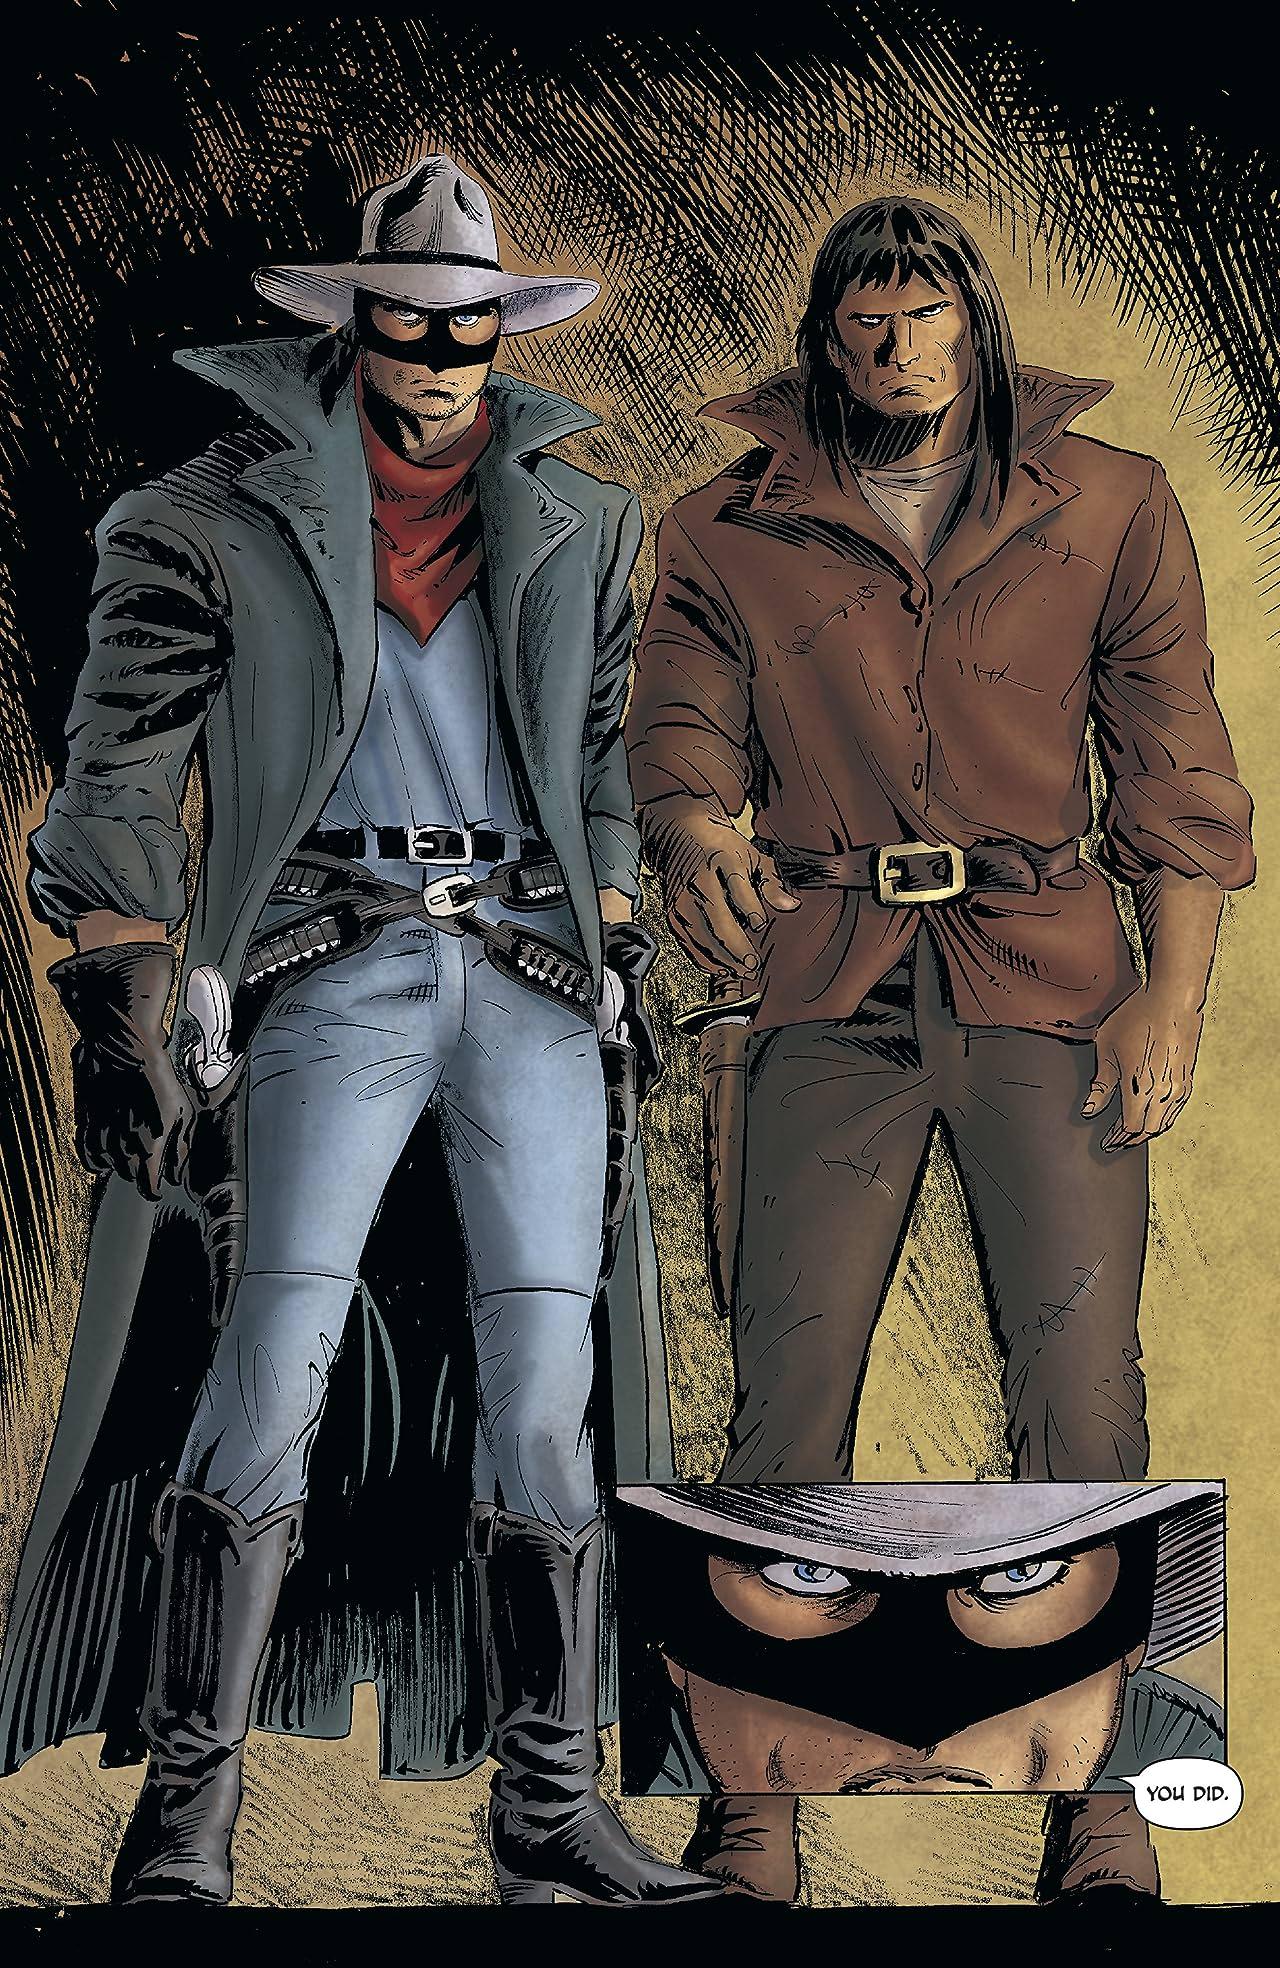 The Lone Ranger #15